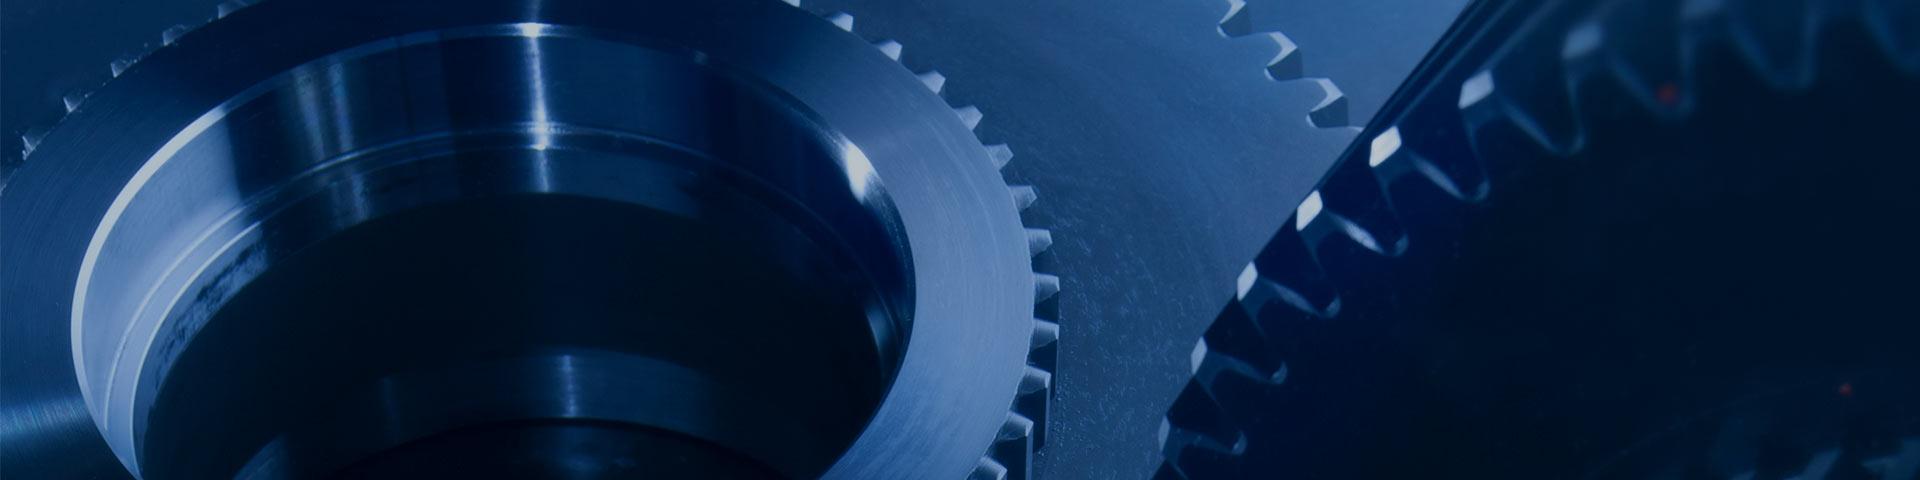 hero-industrial-fluids-gears-1920-480